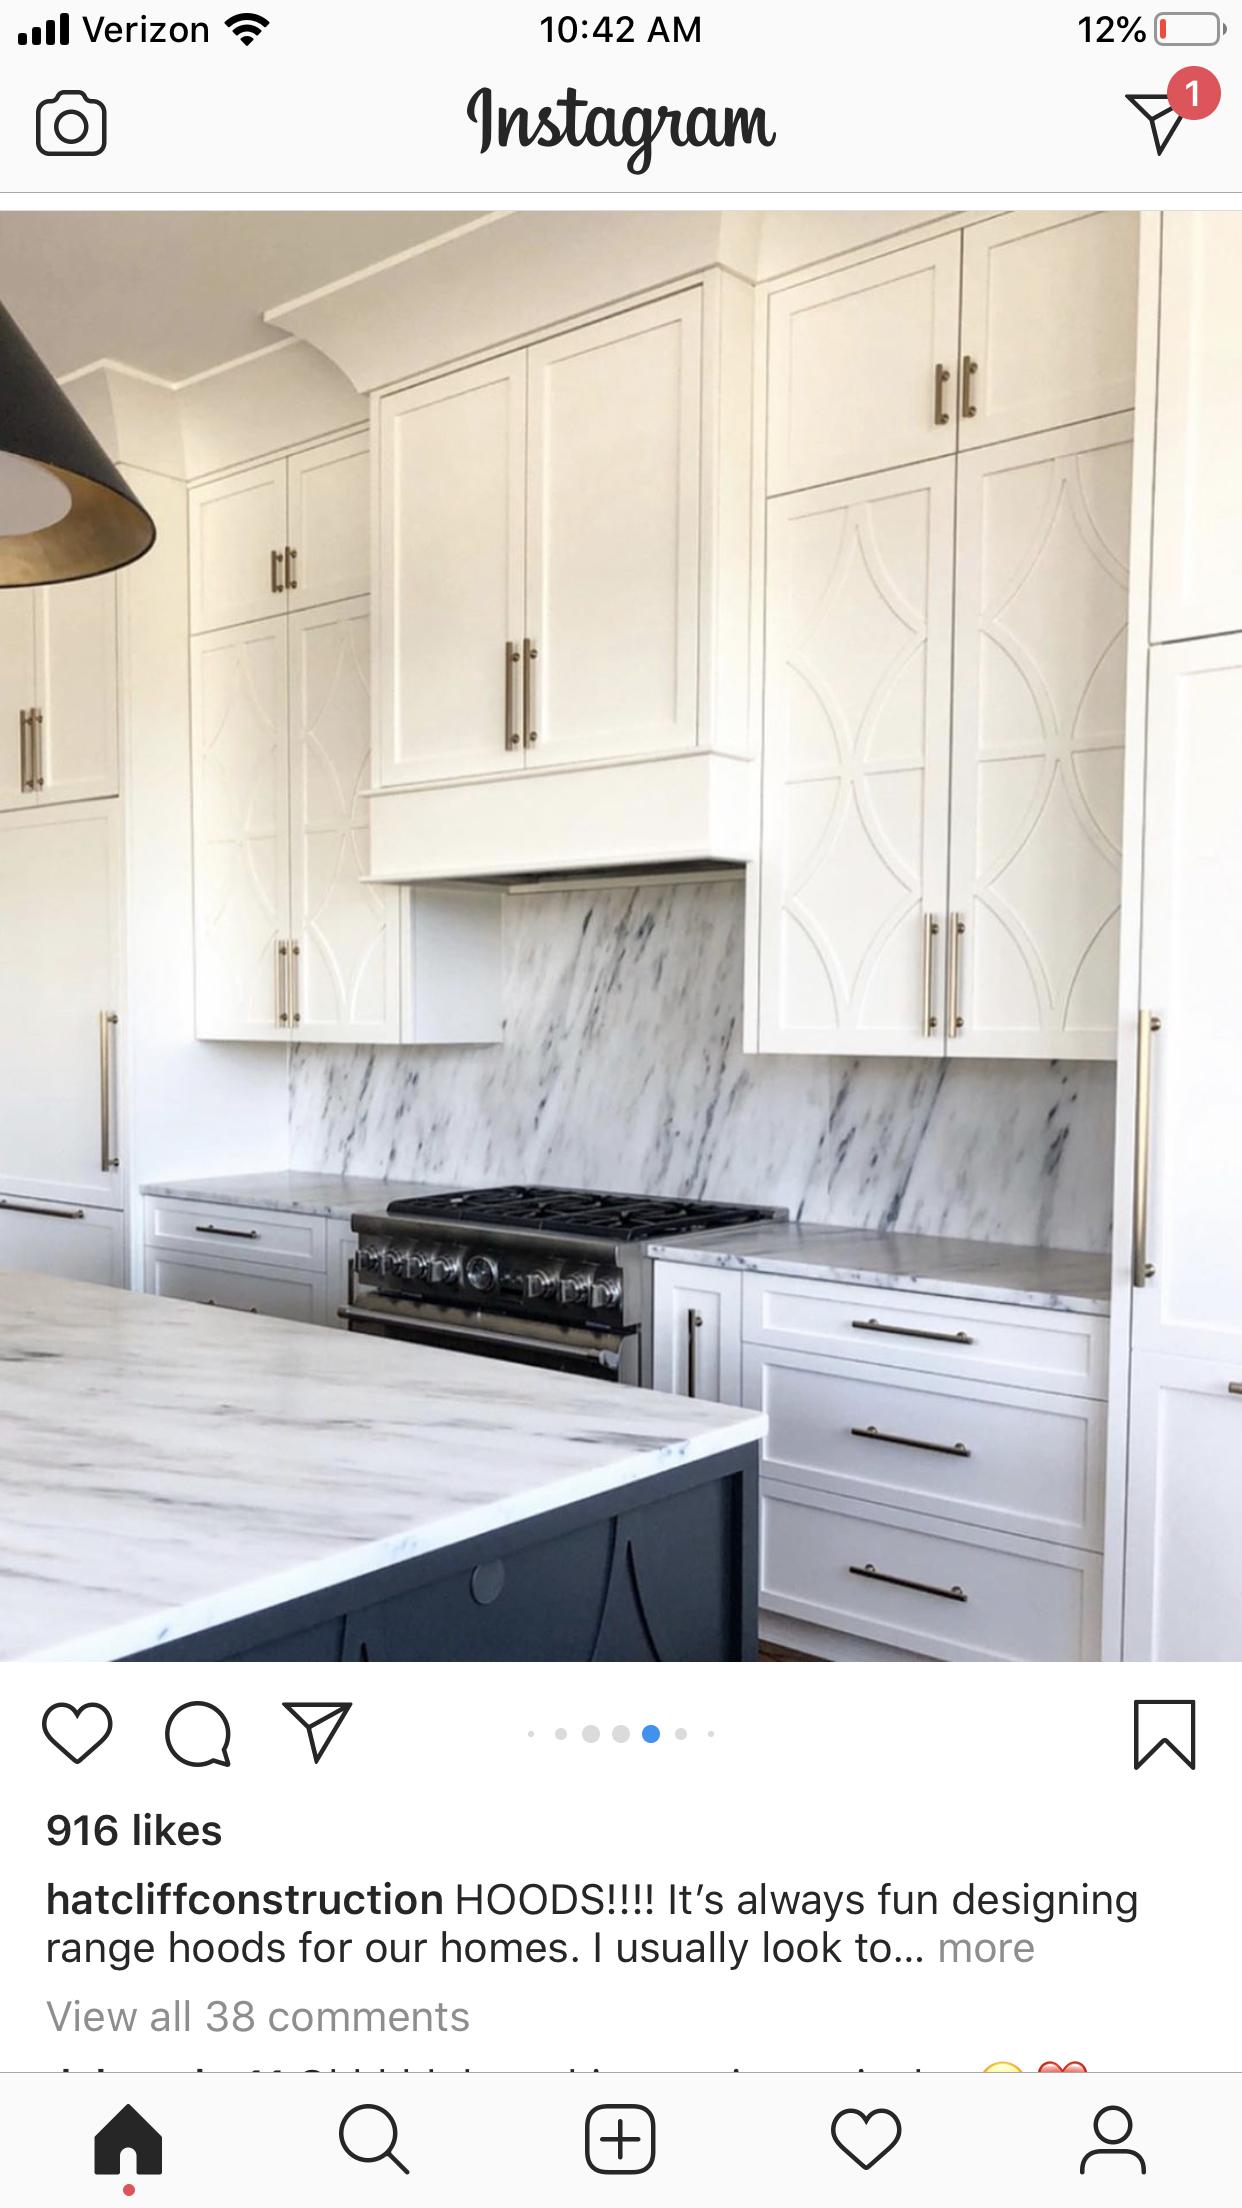 Pin By Alyson Milligan On Kitchen Reno In 2020 Kitchen Reno Kitchen Cabinets Kitchen